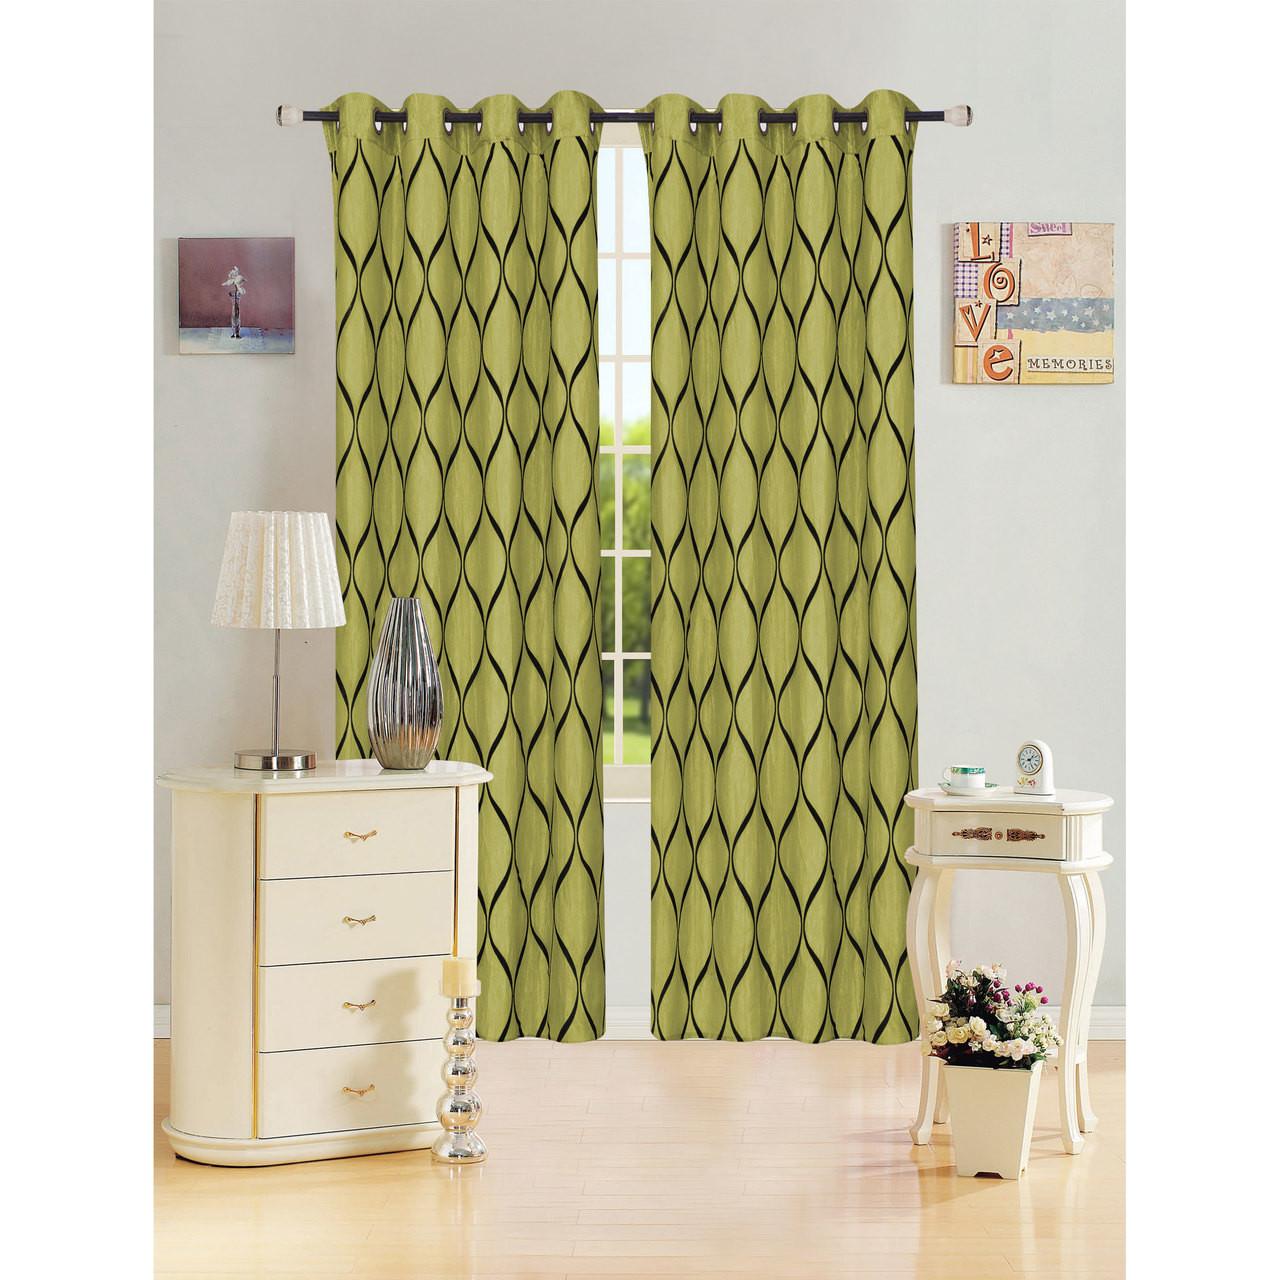 decorative window treatments layered kashi home bianca collection decorative window treatment curtain panel 54 living room